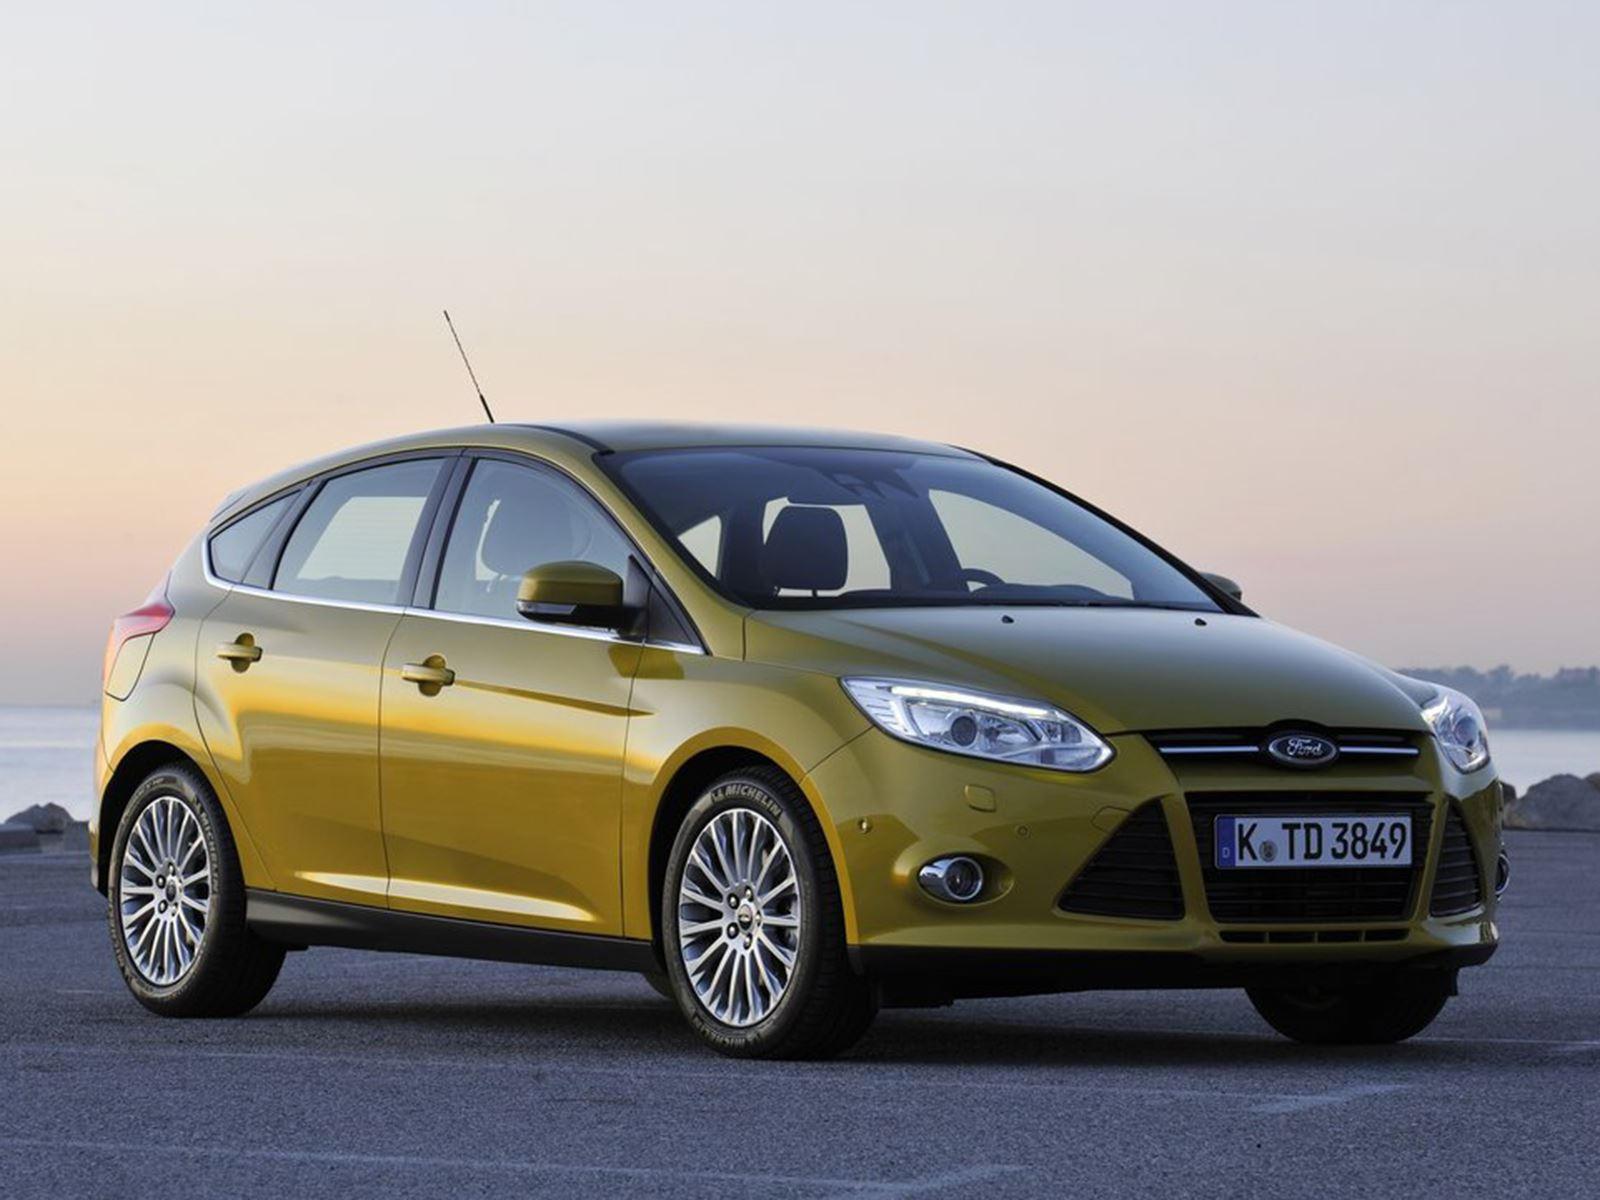 Ford Faces $1 3 Billion Lawsuit Over Defective EcoBoost